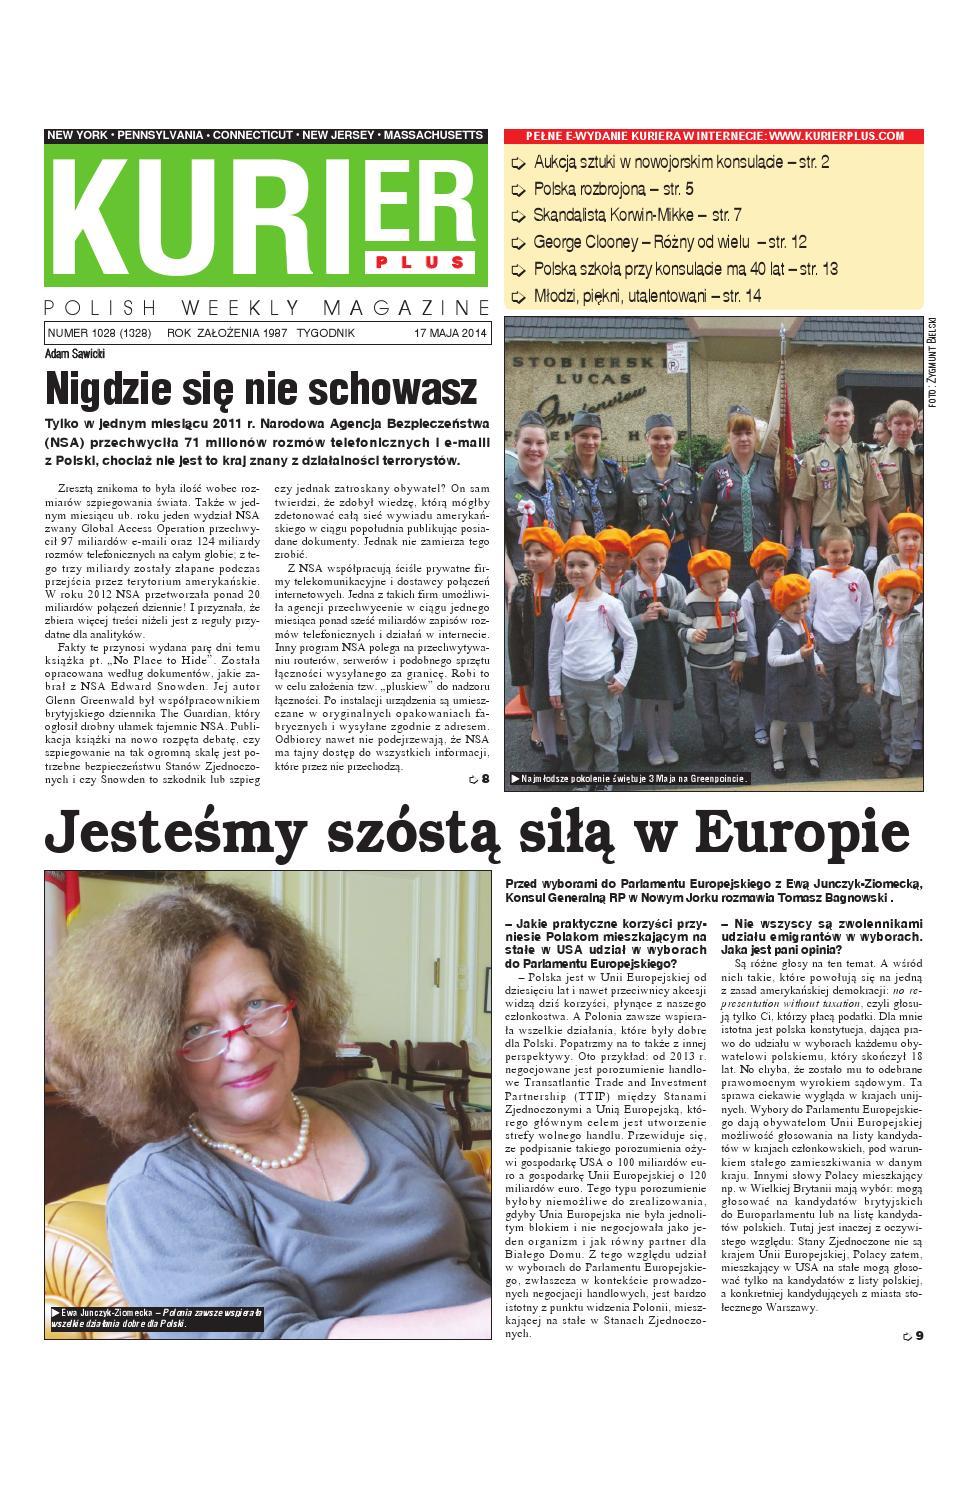 Kurier Plus 17 Maja 2014 By Kurier Plus Issuu